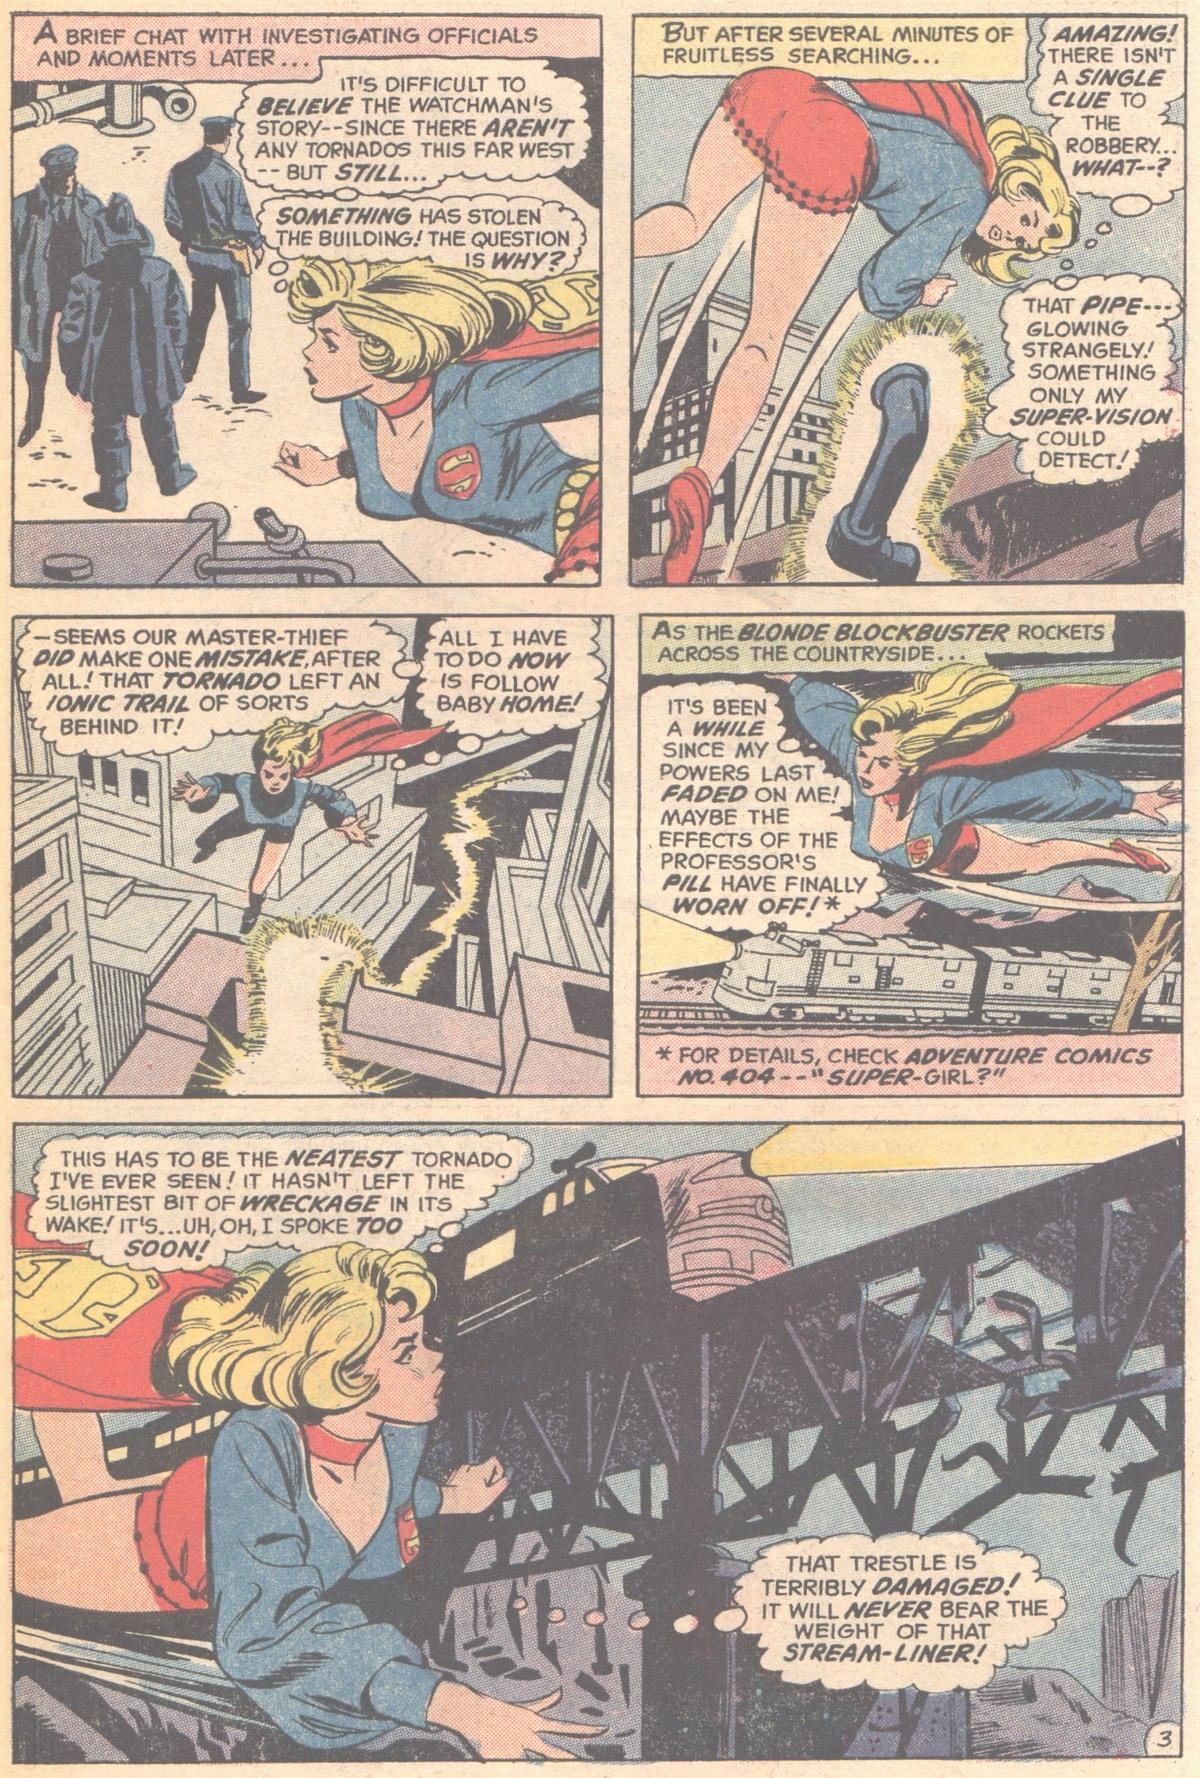 Read online Adventure Comics (1938) comic -  Issue #414 - 5